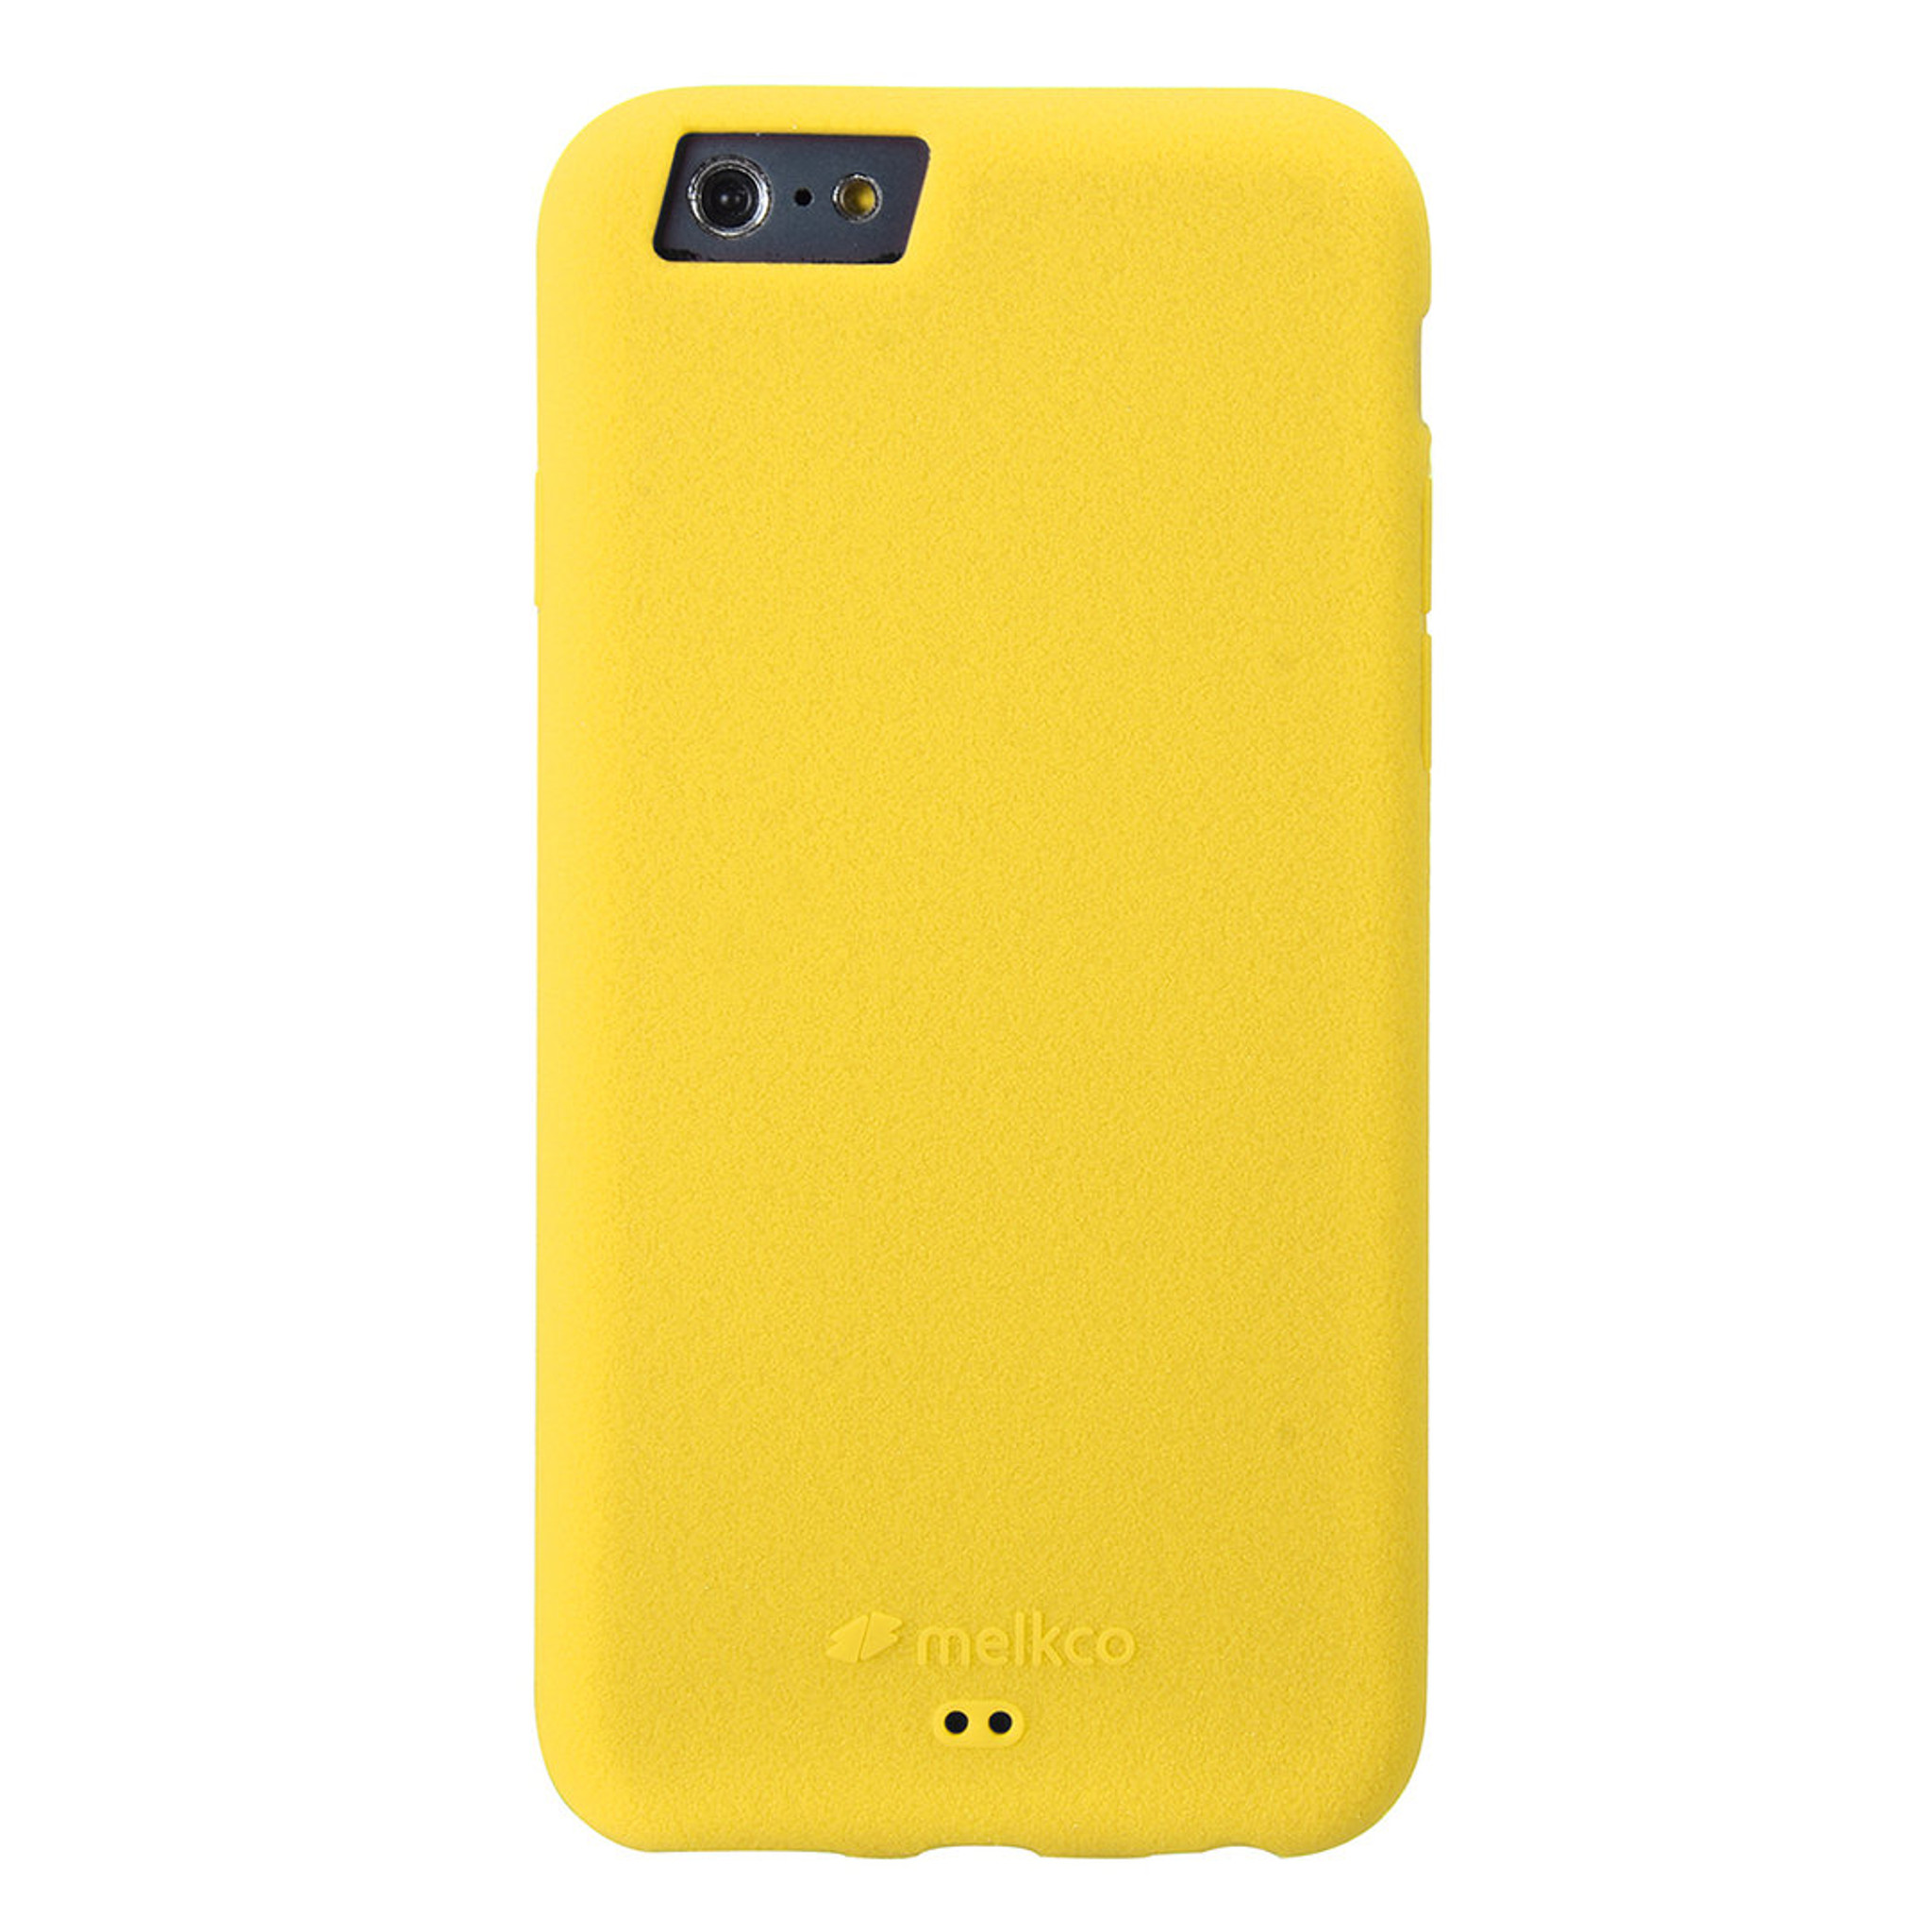 1ec883533e8 Melkco Silikonovy Silicone Case for Apple iPhone 6 Yellow in Pakistan